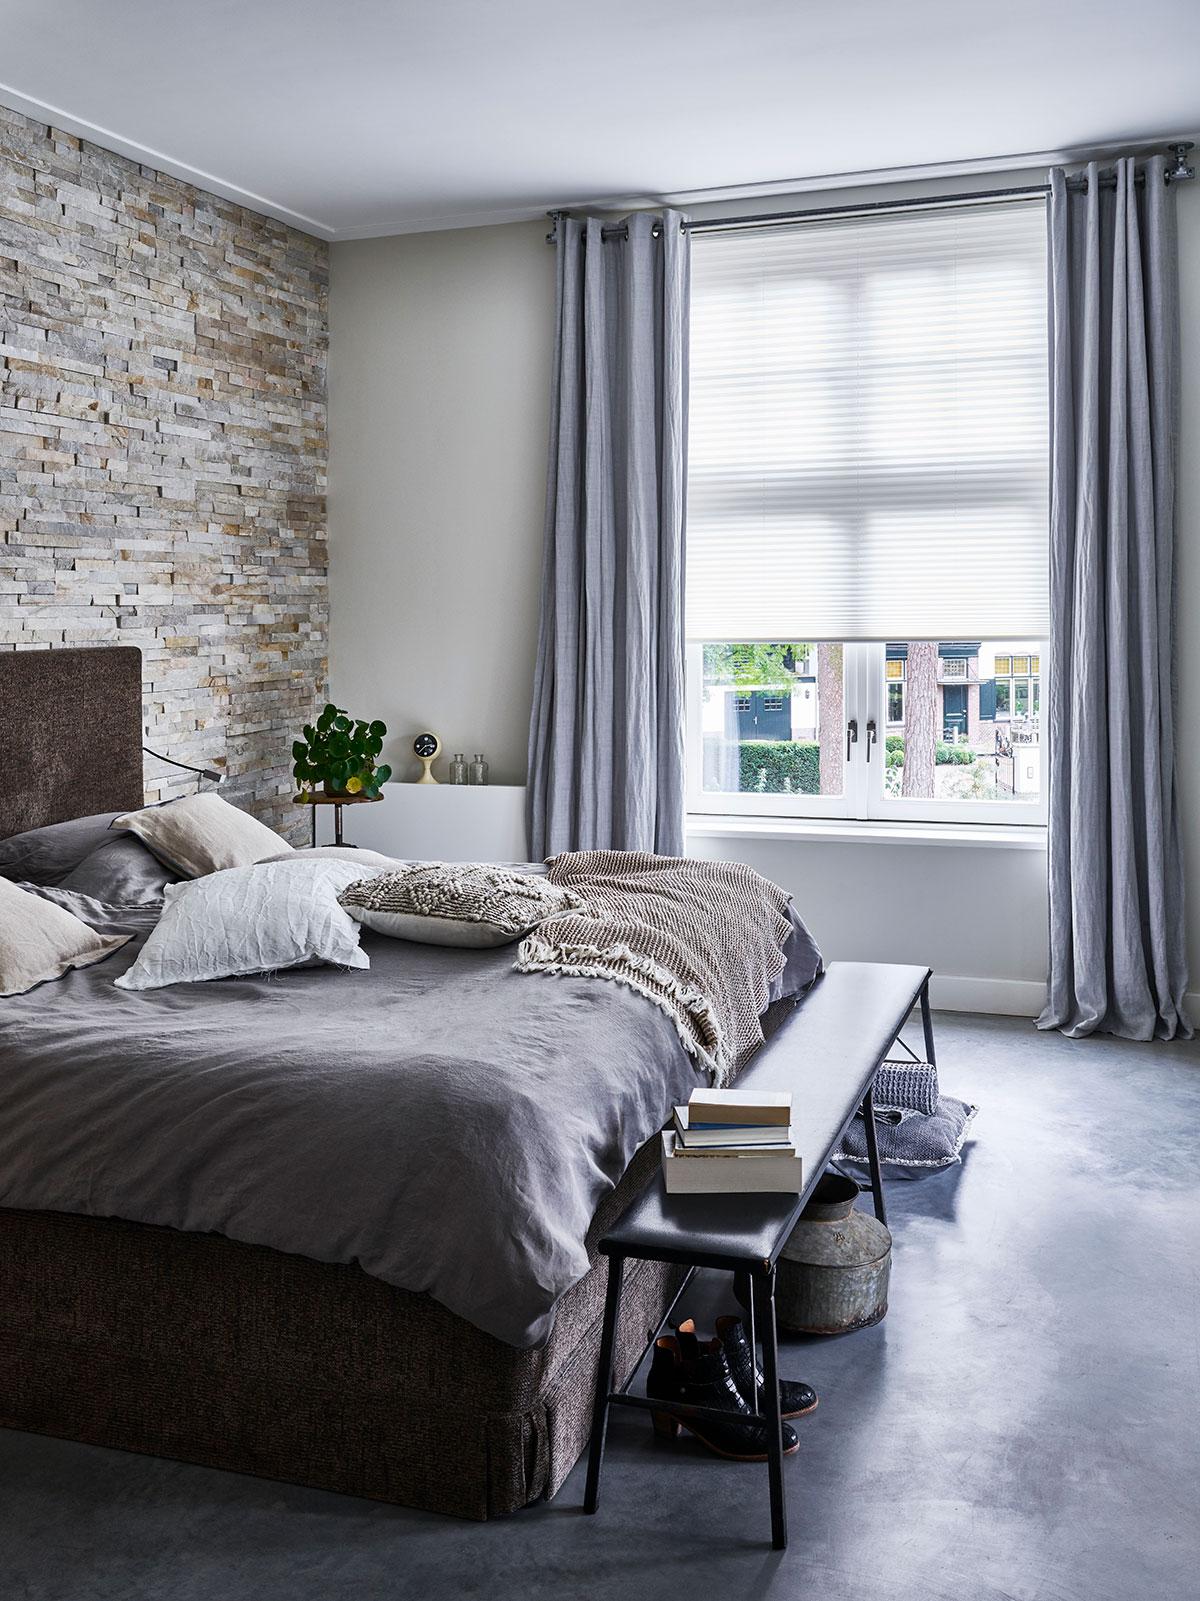 Groenevelt Zonwering & Raamdecoratie - B&C Plisse gordijnen